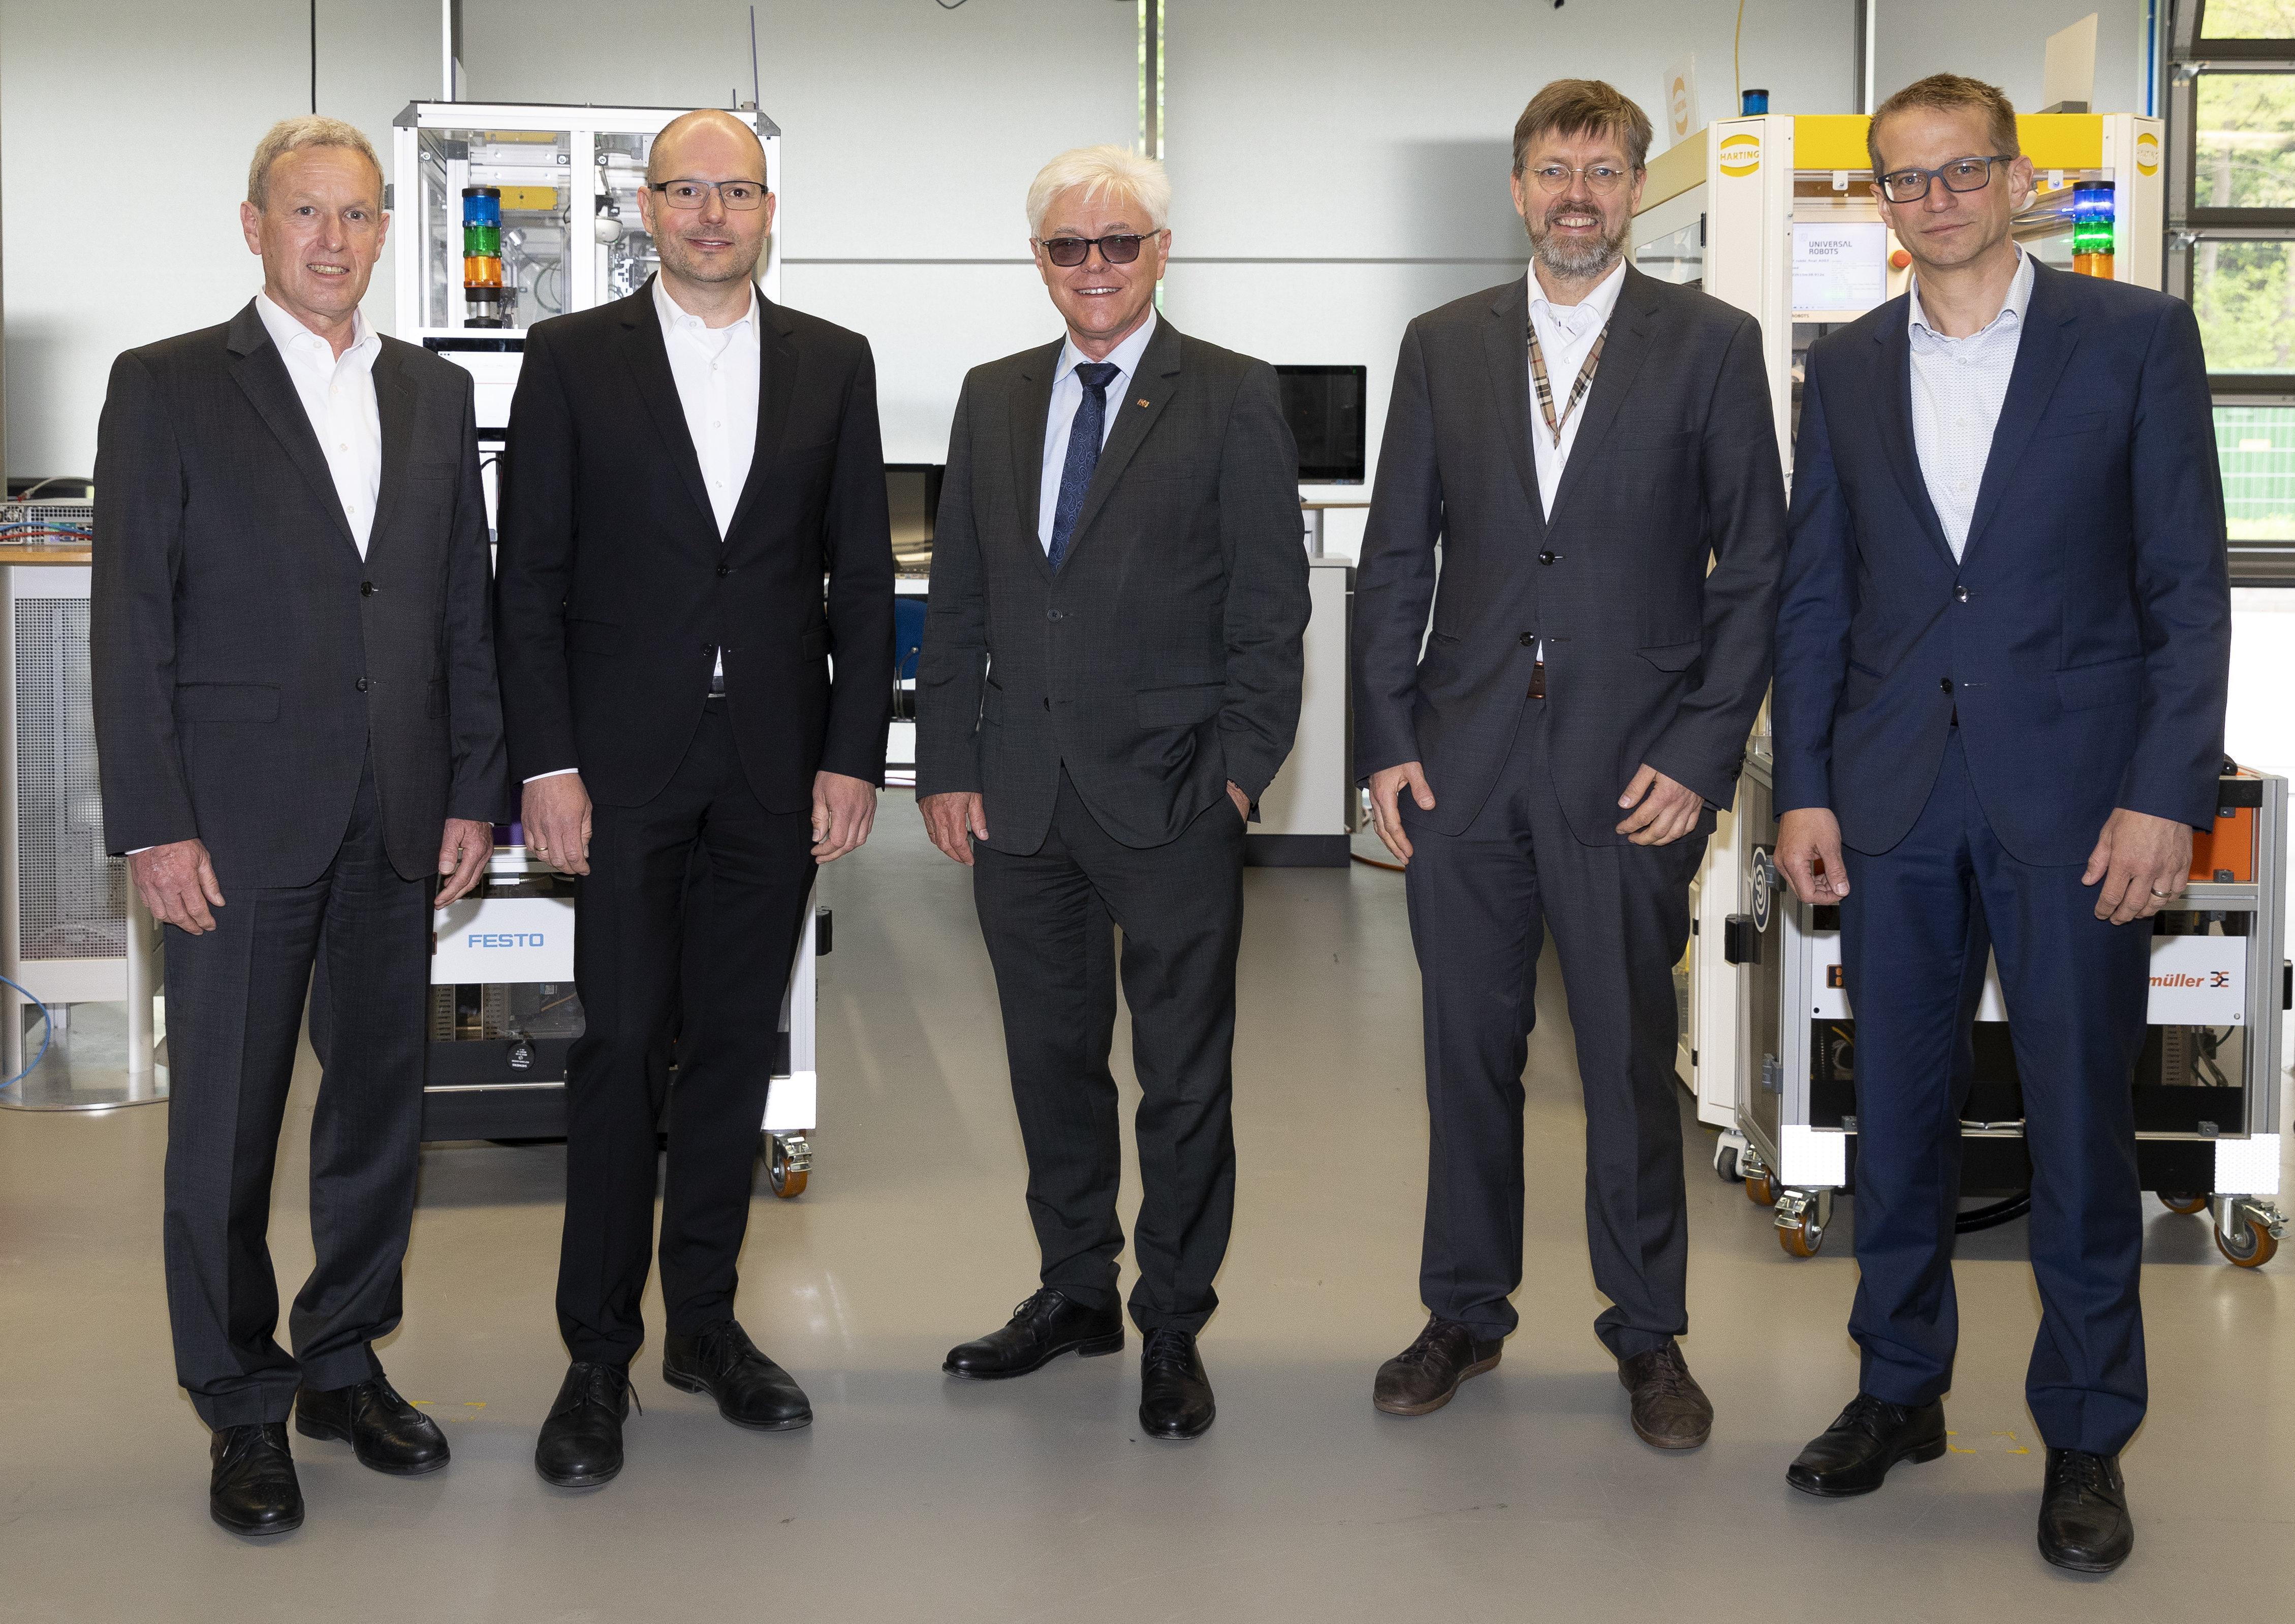 Der Vorstand der Technologie-Initiative SmartFactory KL e.V. (v.l.n.r.): Klaus Stark, Prof. Dr. Martin Ruskowski (Vorsitzender), Prof. Dr. Detlef Zühlke (Ehrenmitglied), Andreas Huhmann, Dr. Thomas Bürger. Foto: SmartFactoryKL /M. Schäfer